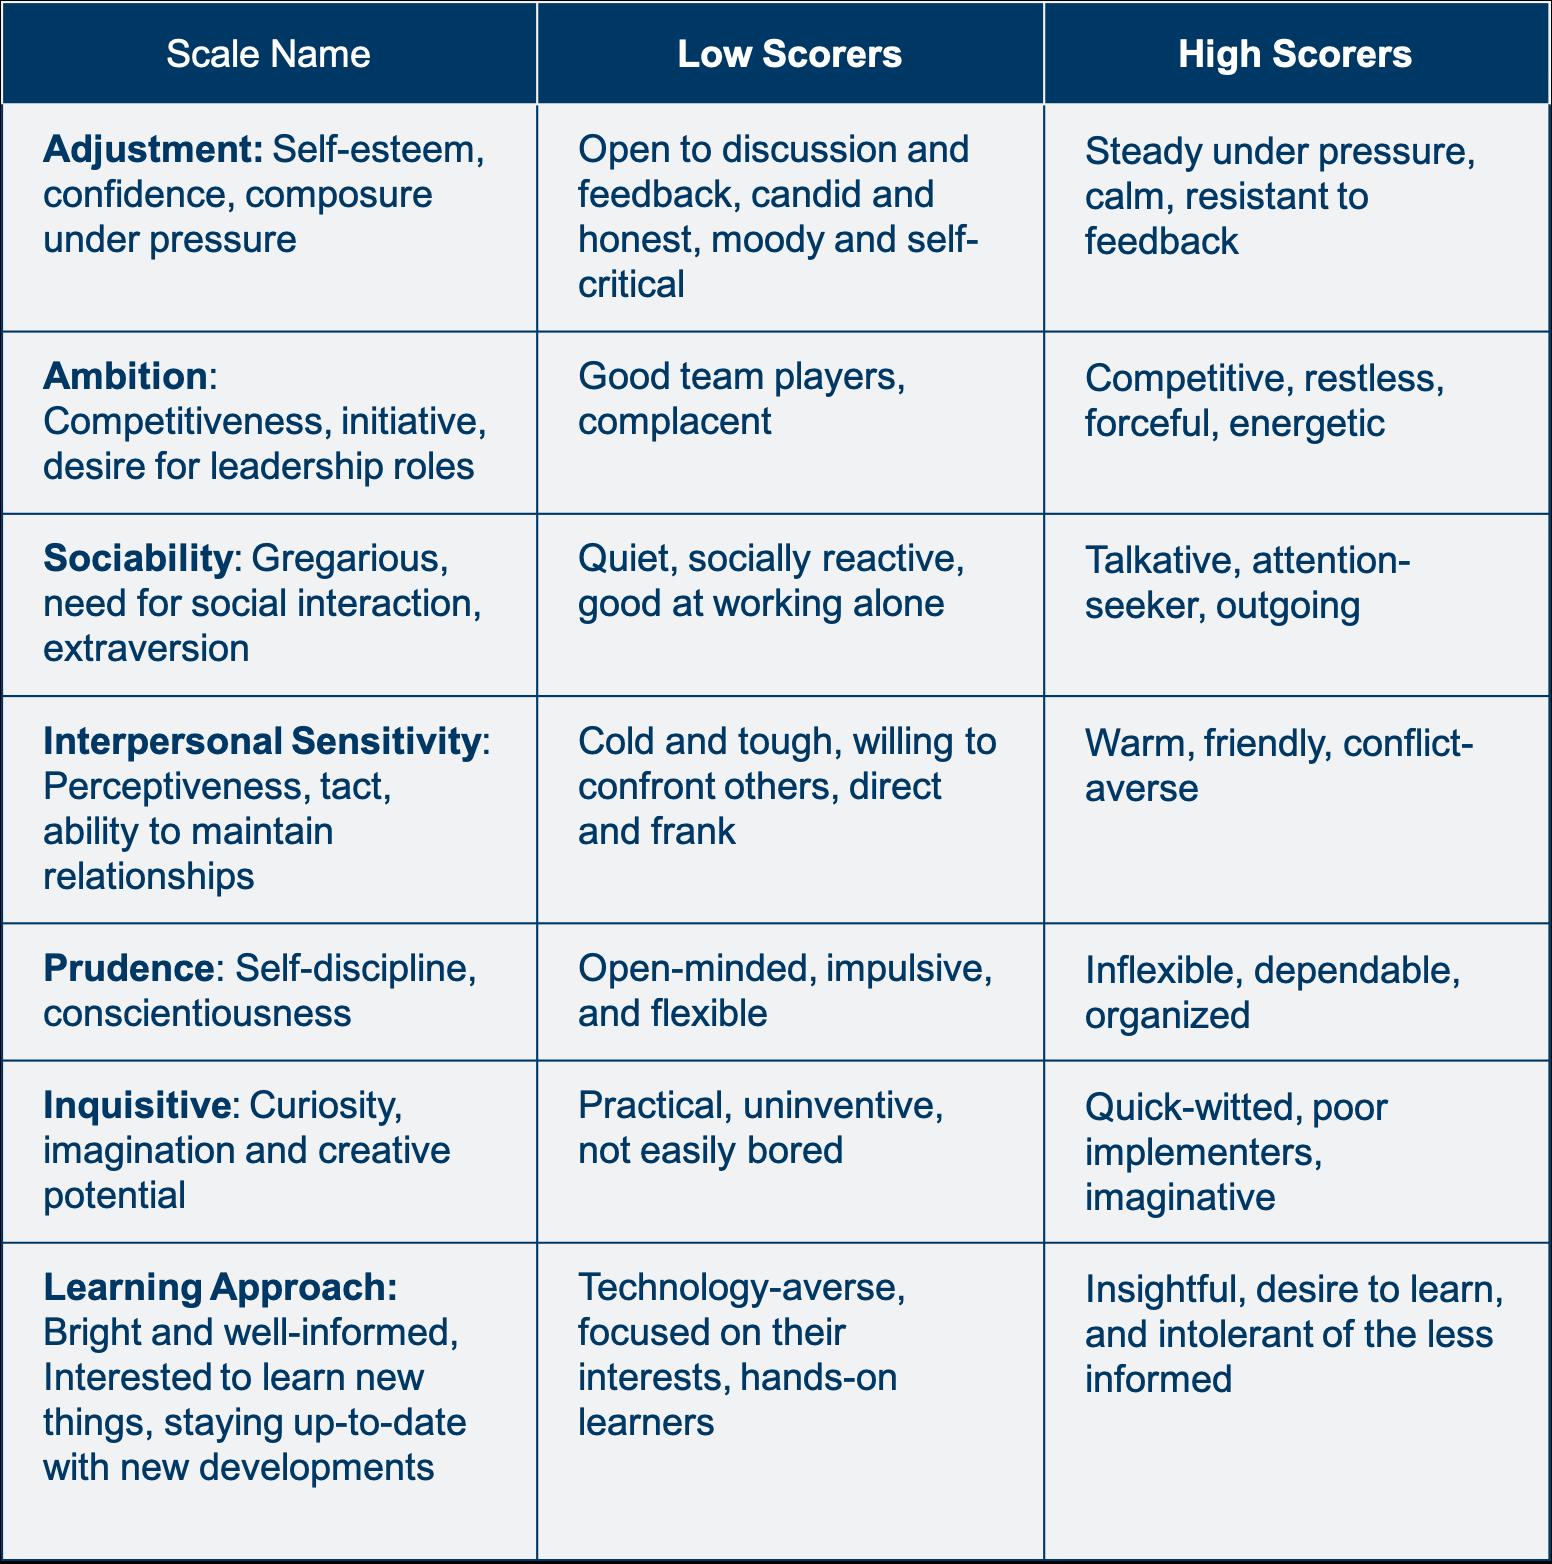 Primary Scales And Interpretations